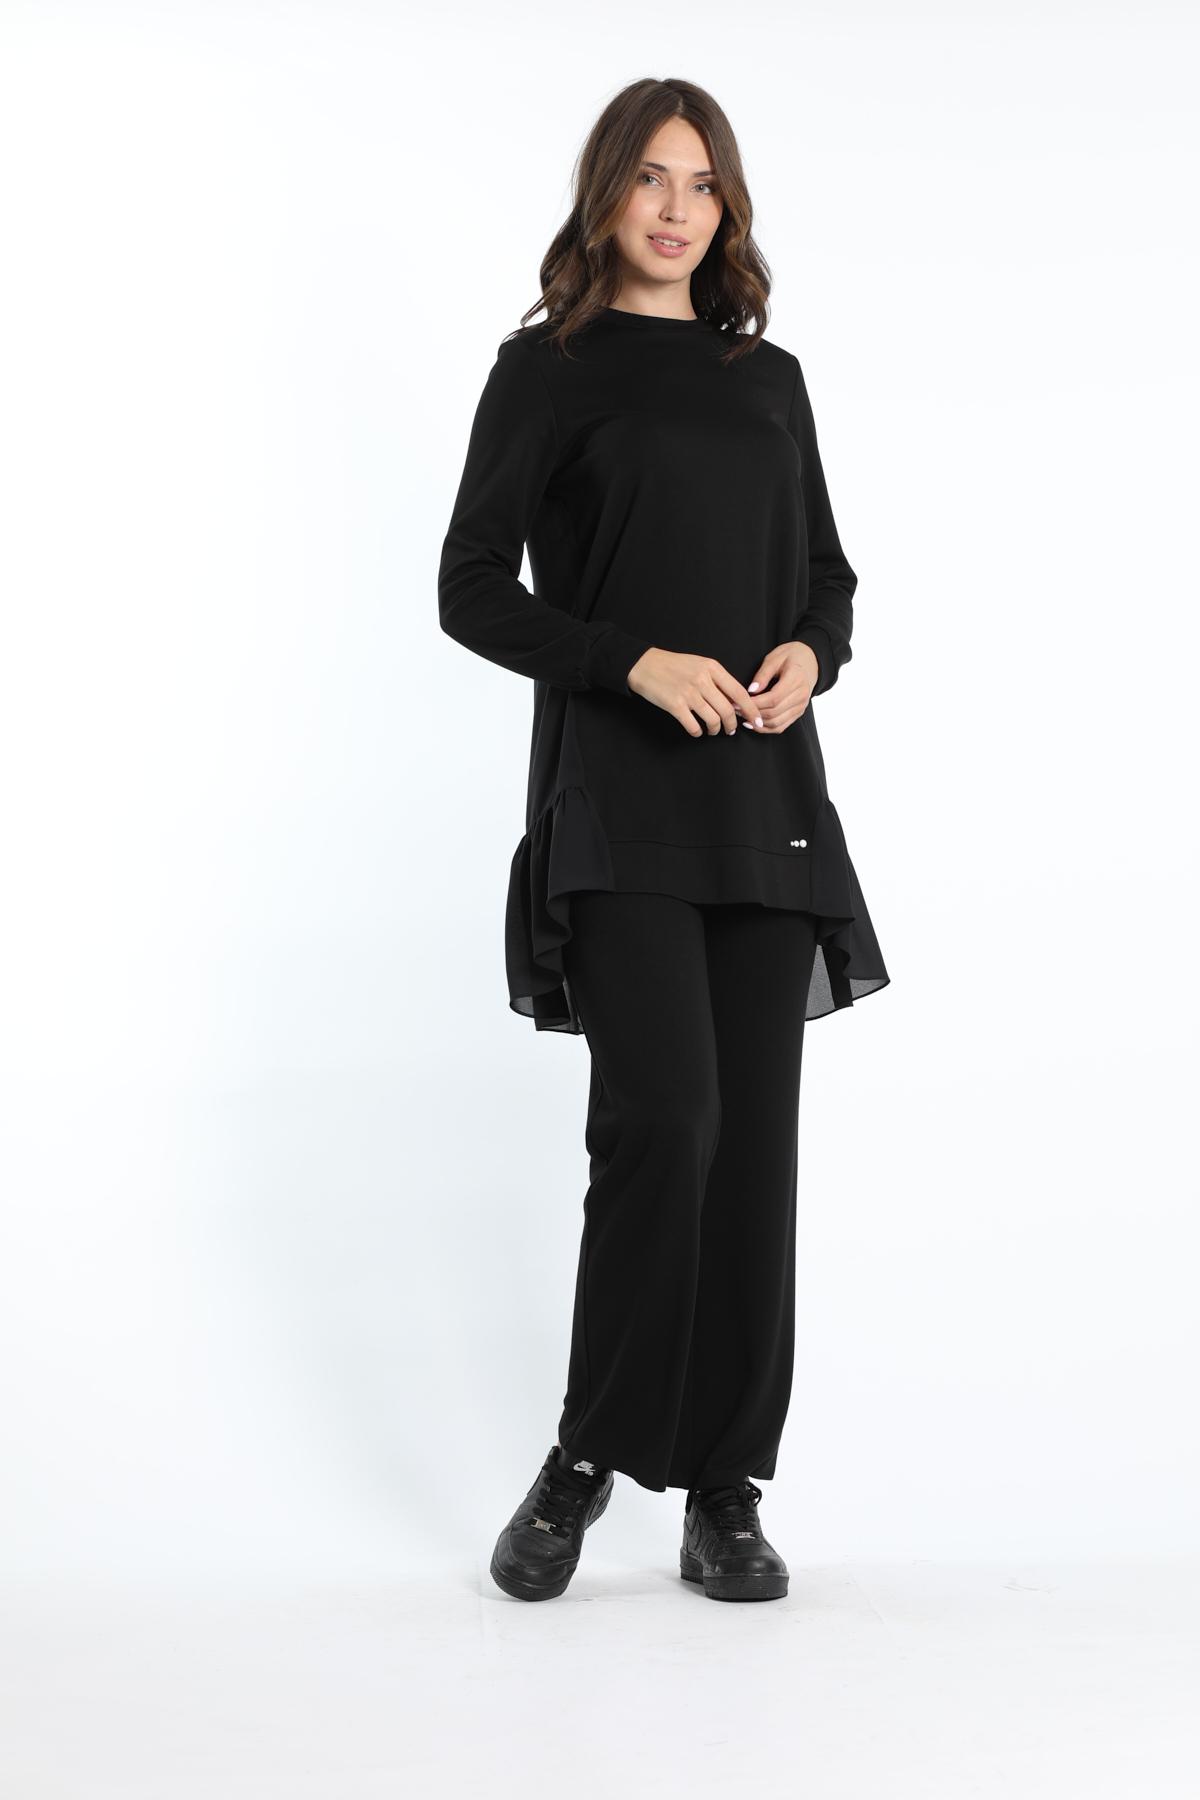 Rena Eşofman Takımı Siyah-Siyah 22101s20